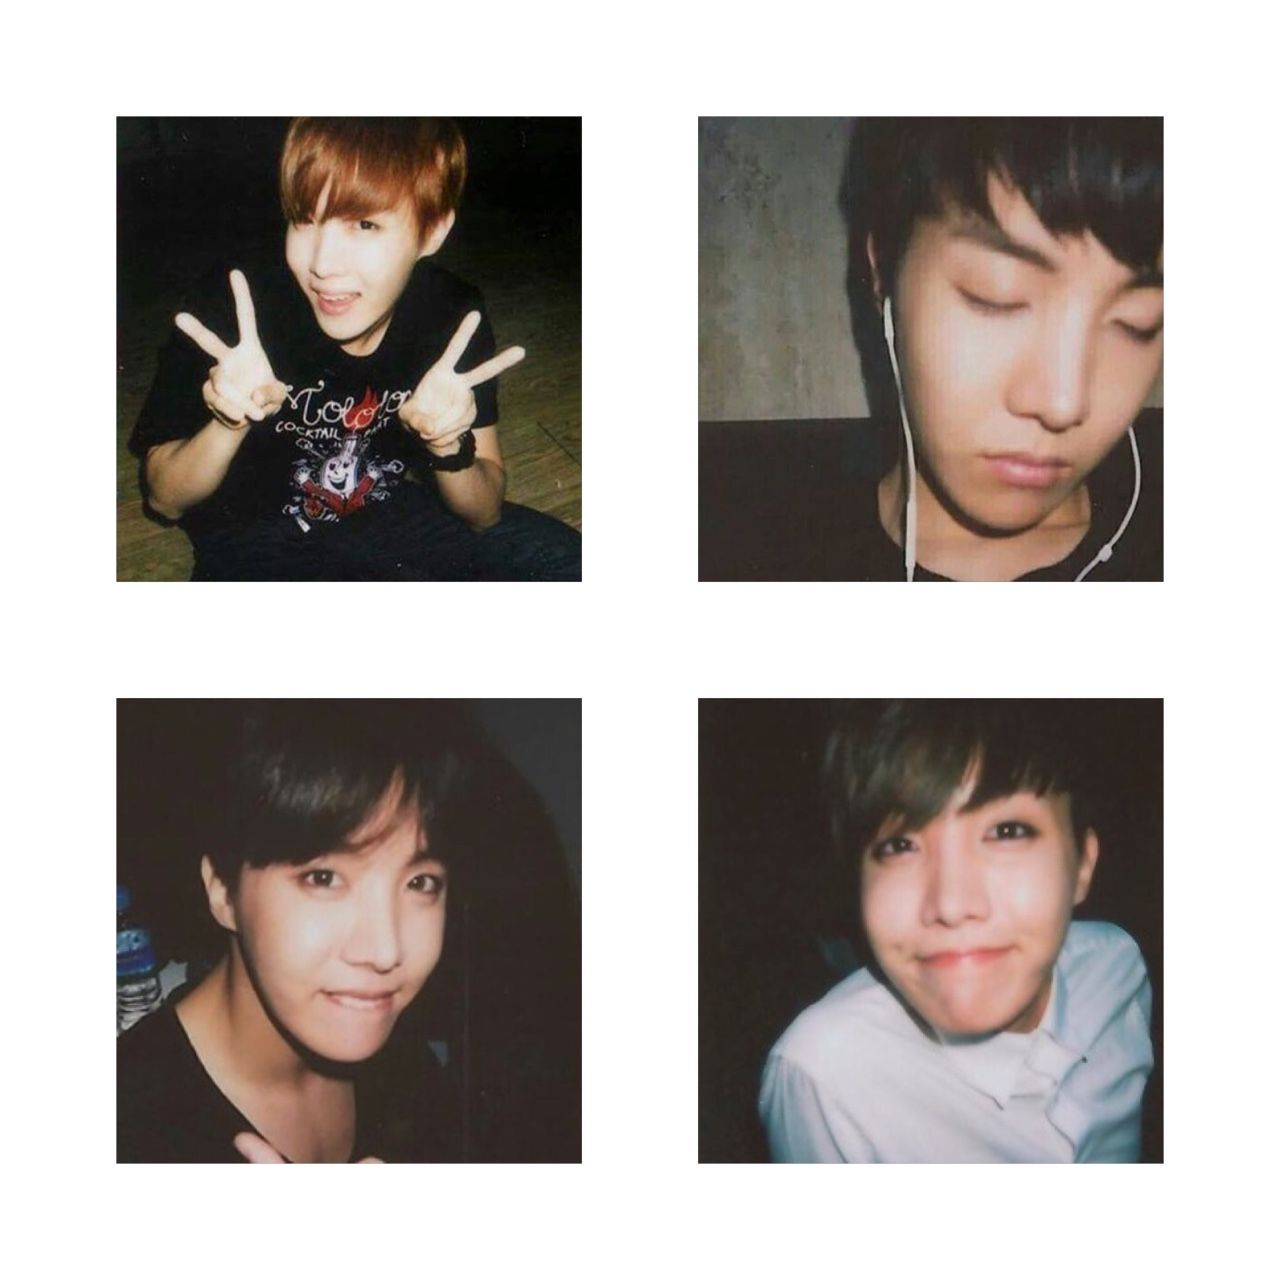 bts polaroid | Tumblr